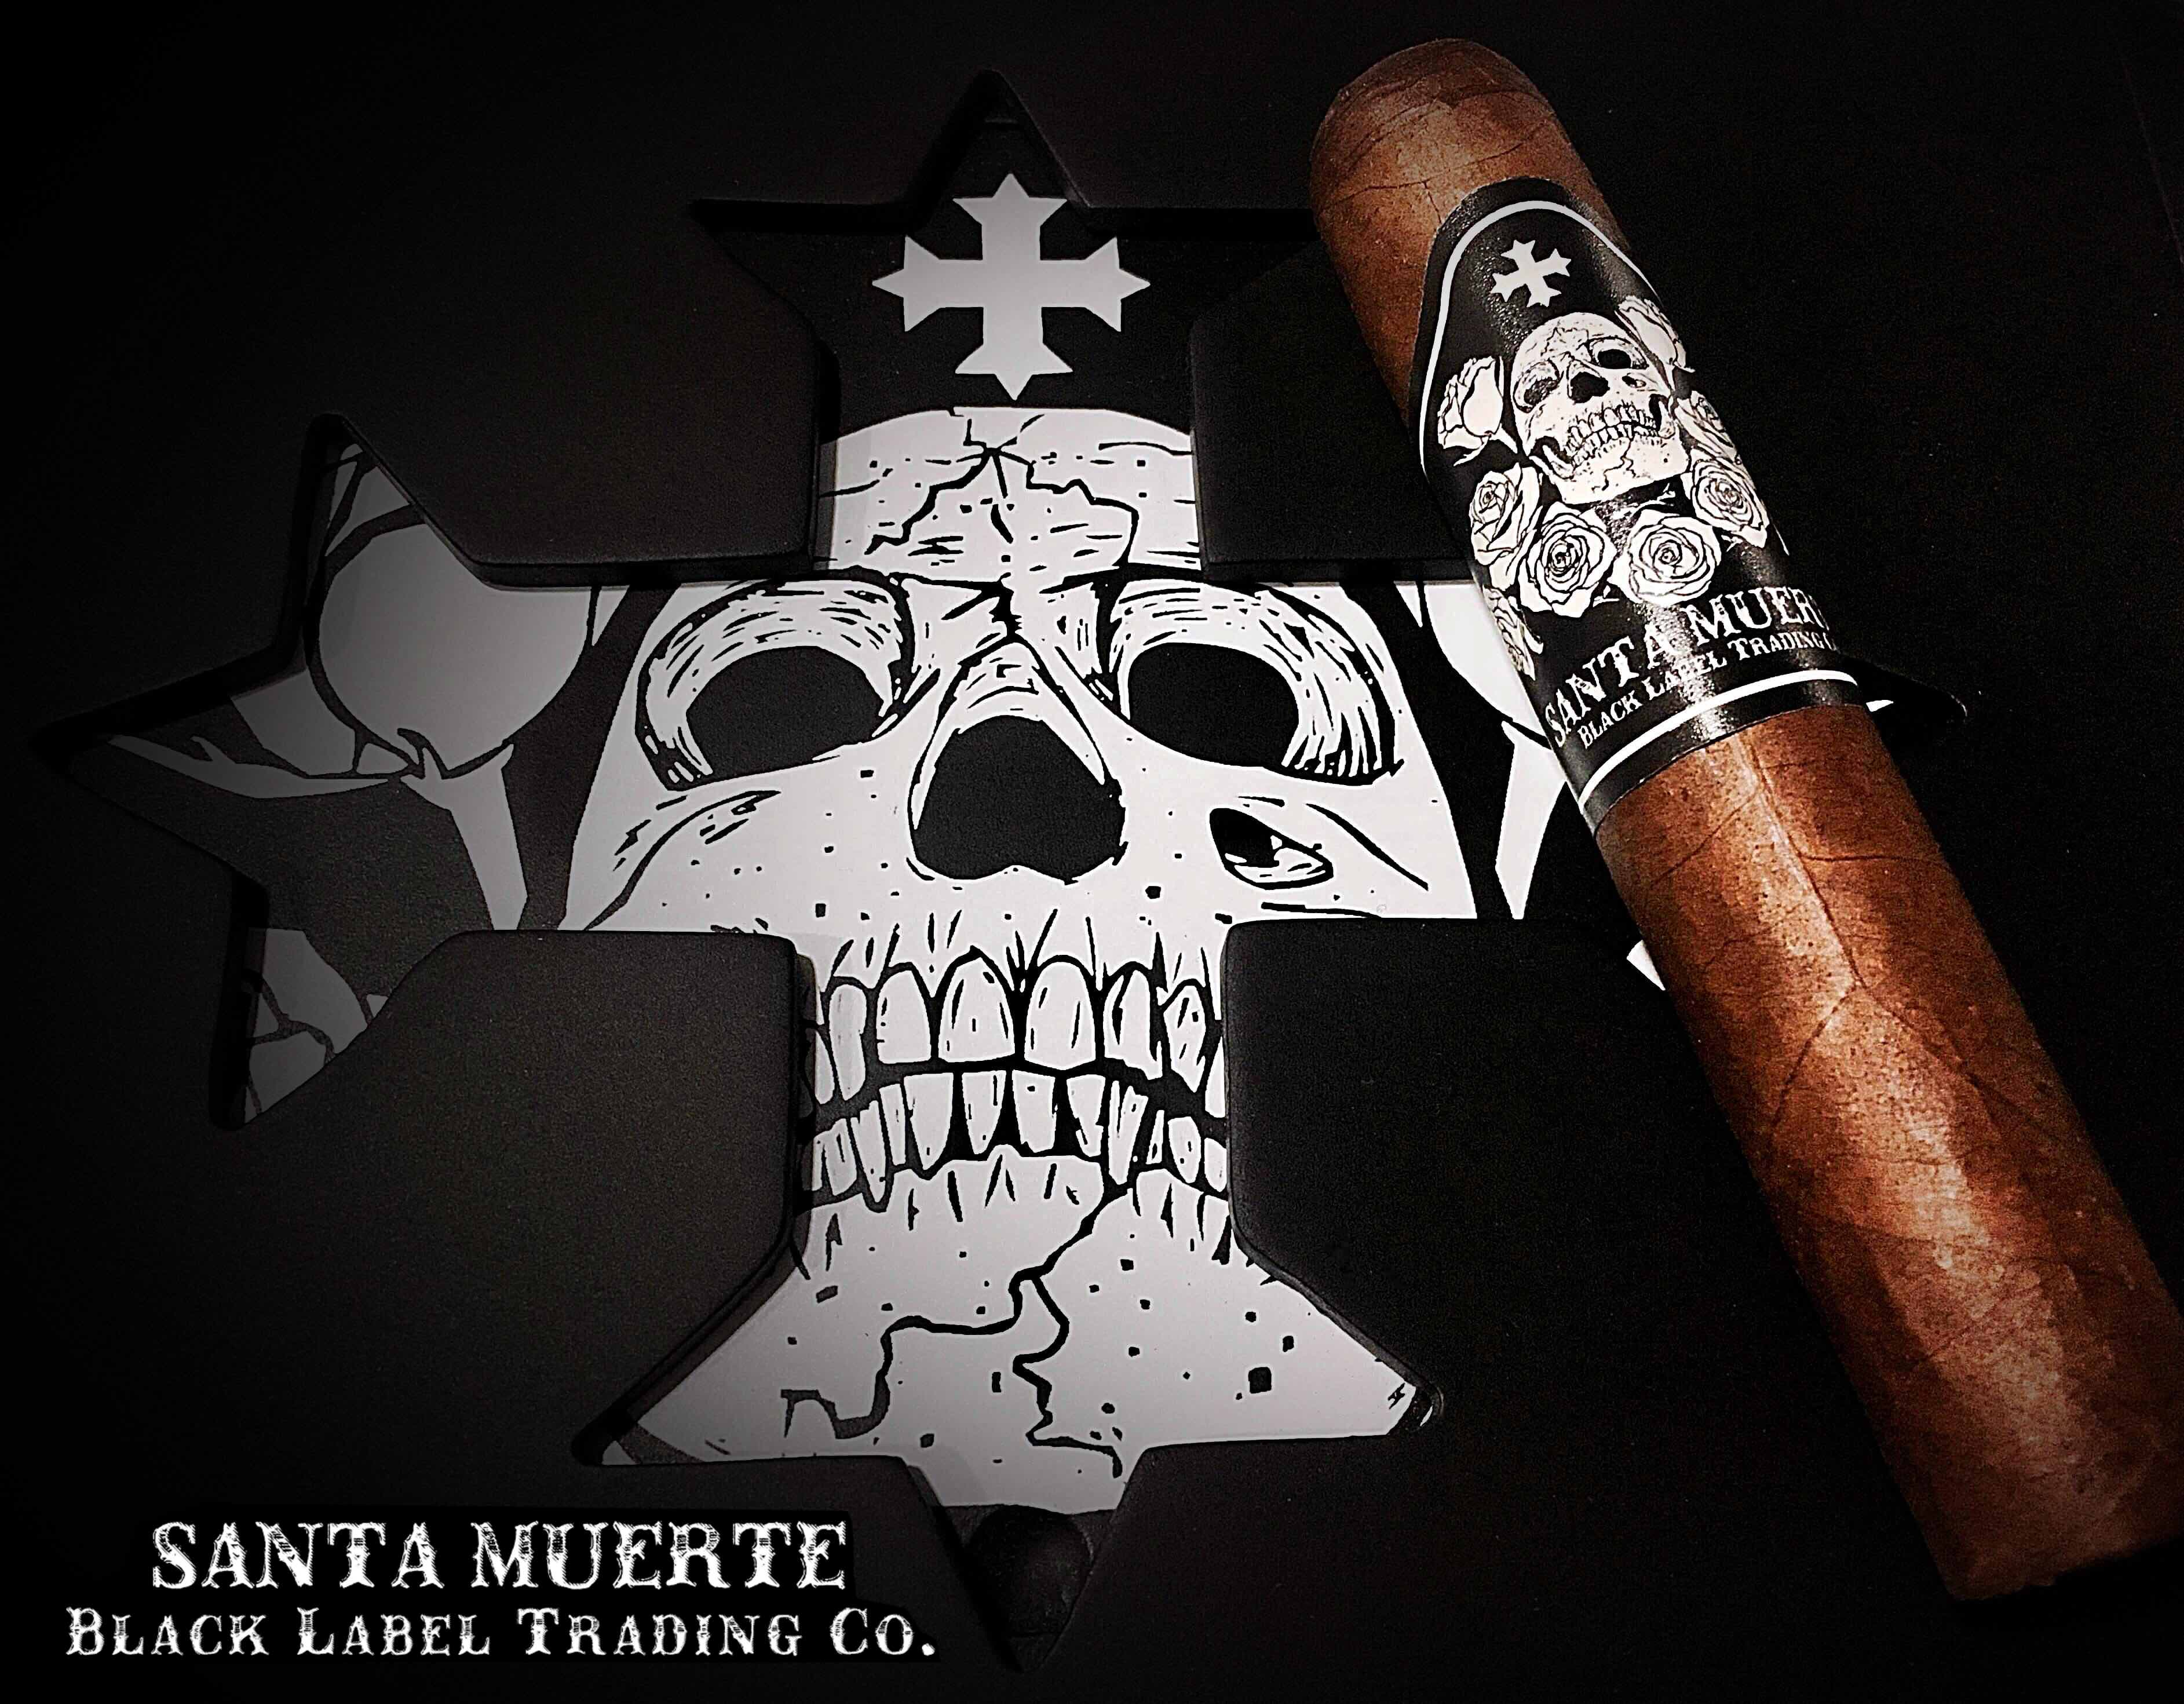 Cigar News: Black Label Trading Company Santa Muerte Returns for 2018